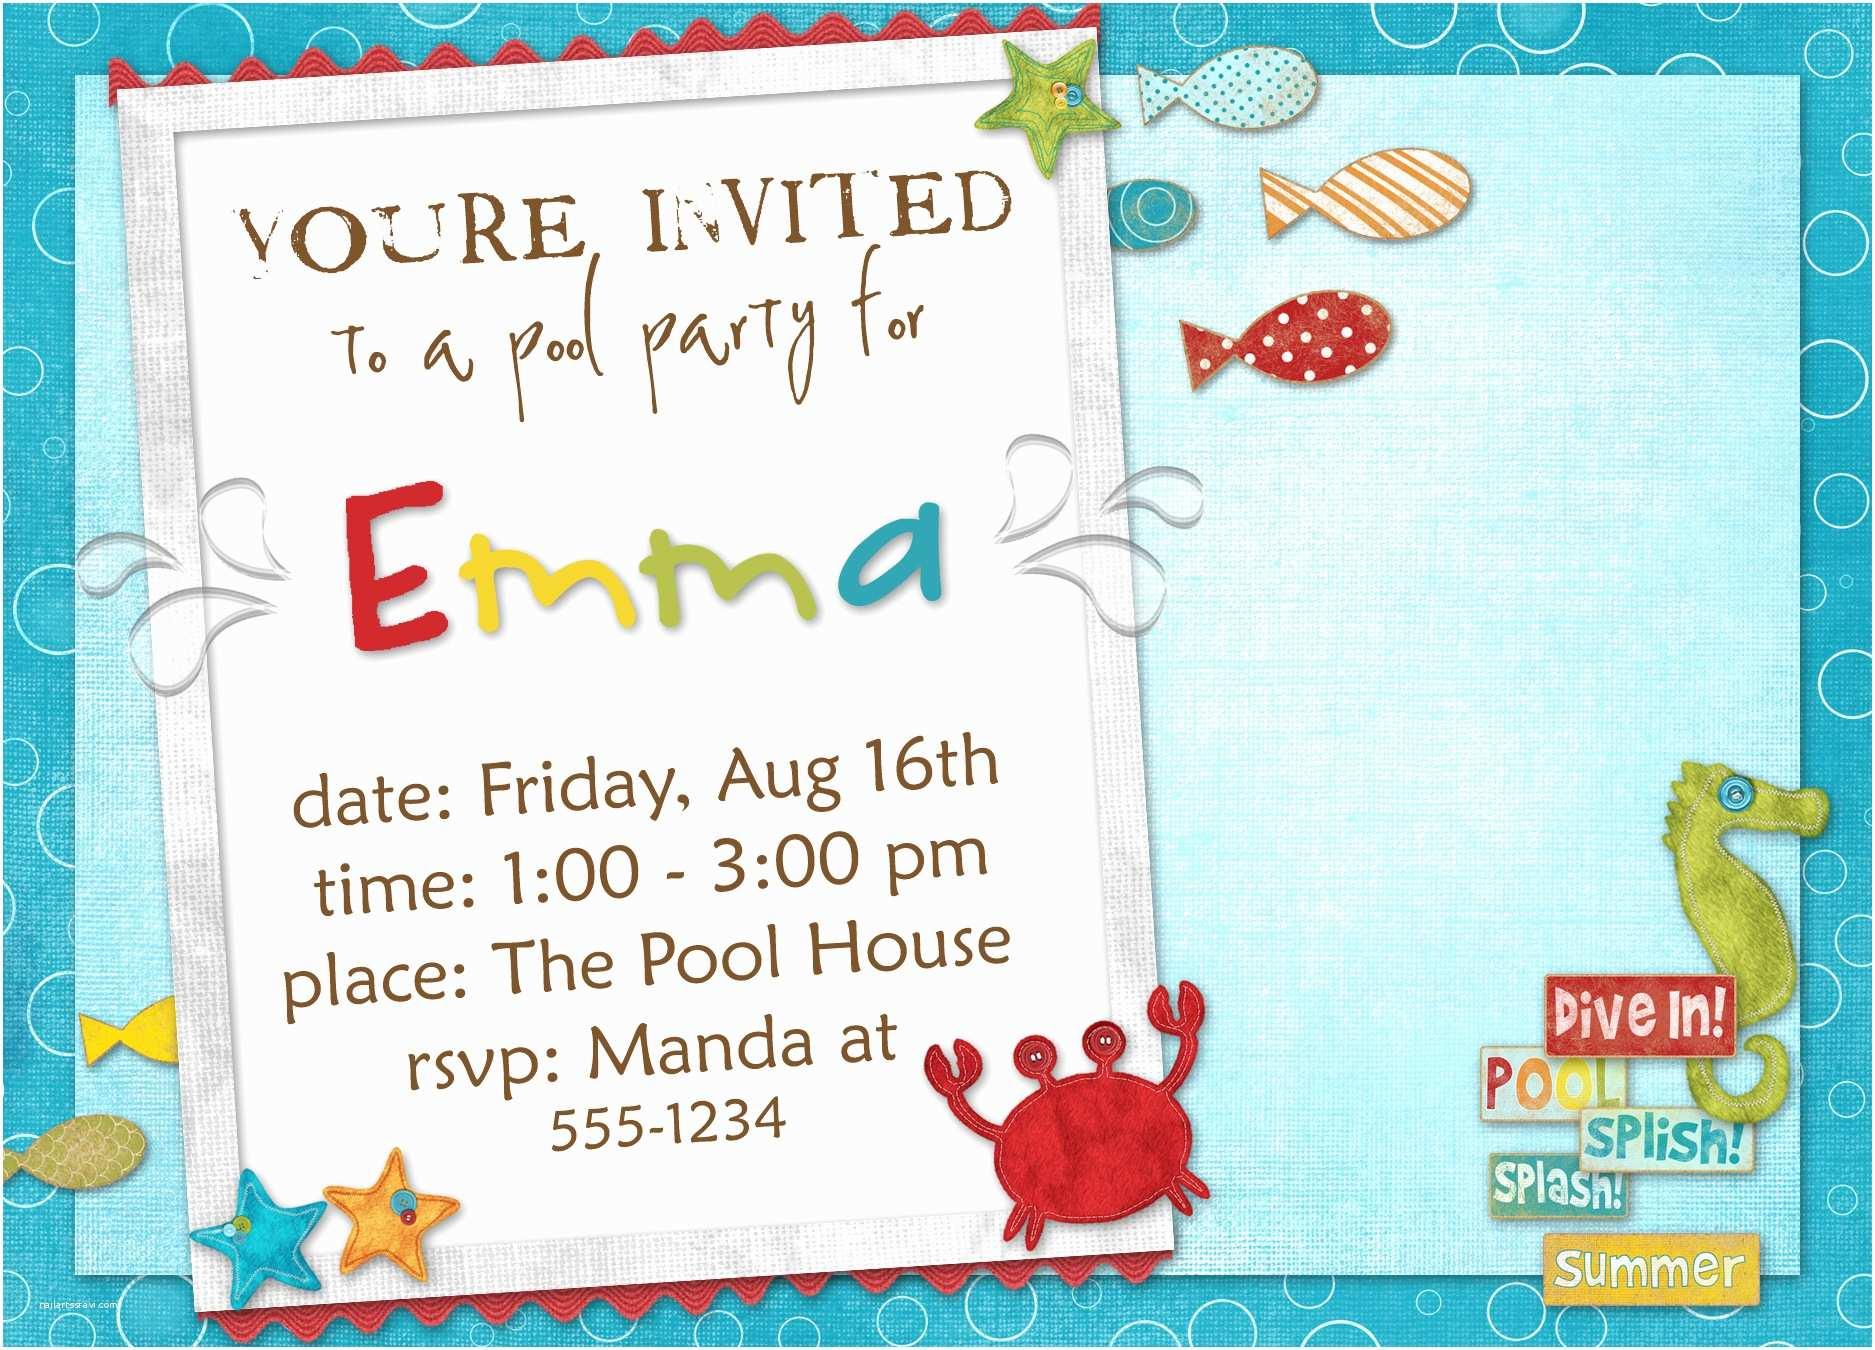 Sample Birthday Invitation formal Invitation for Birthday Image Collections